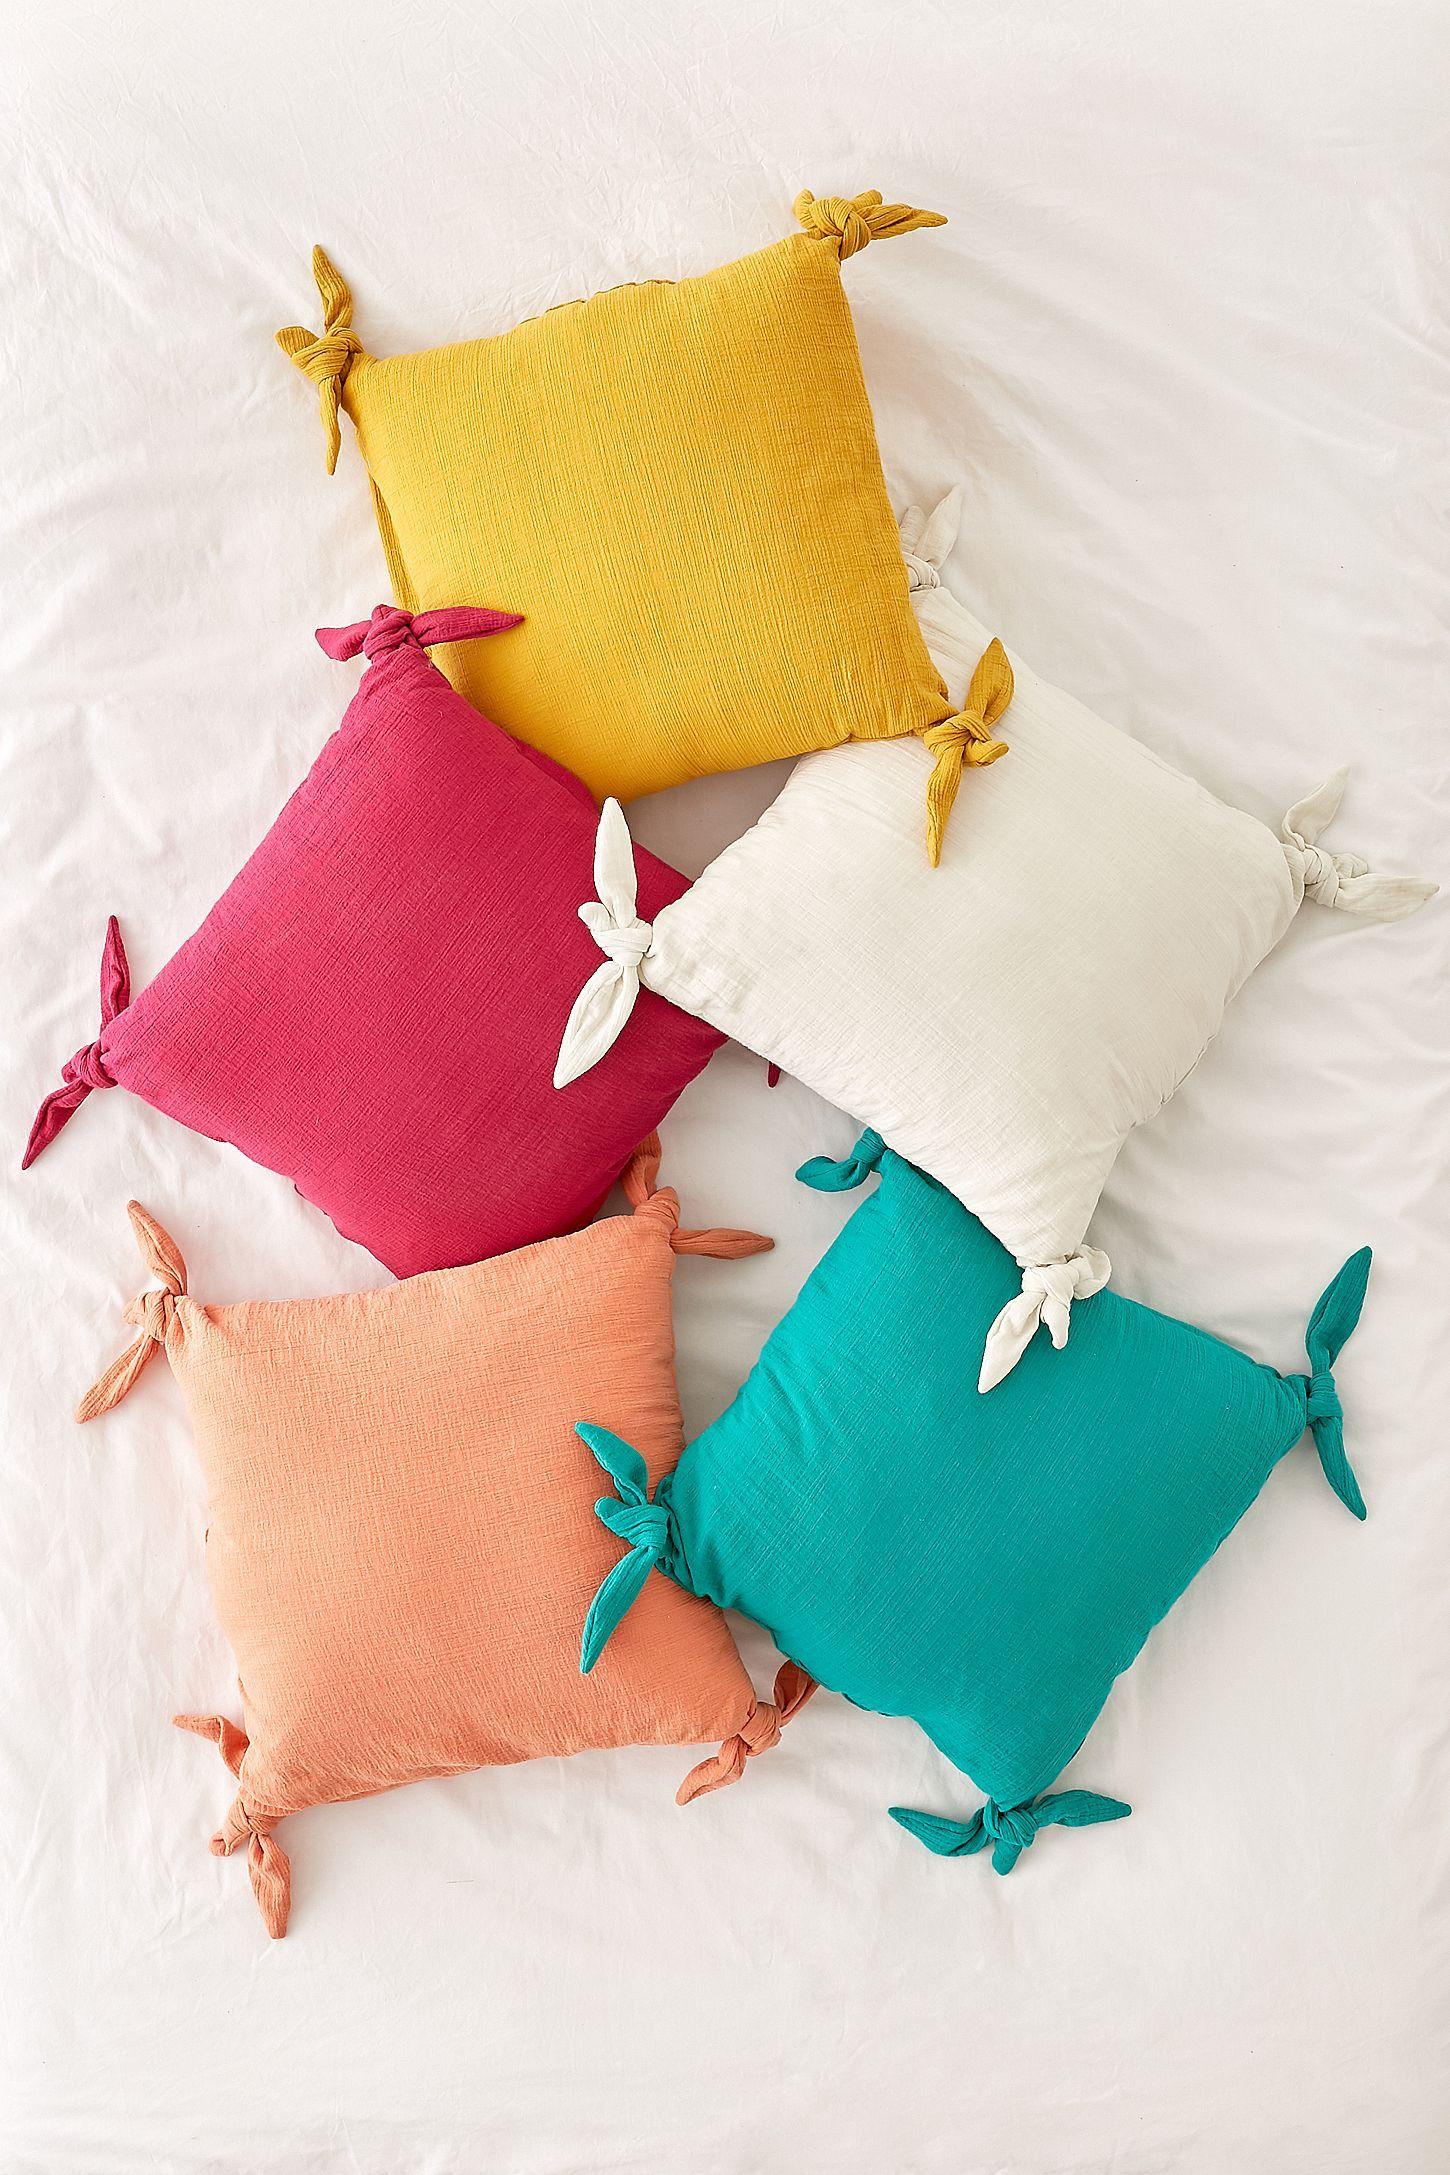 Magical Thinking Wood Block Medallion Comforter Snooze Set Diy Pillows Stylish Throw Pillows Throw Pillows